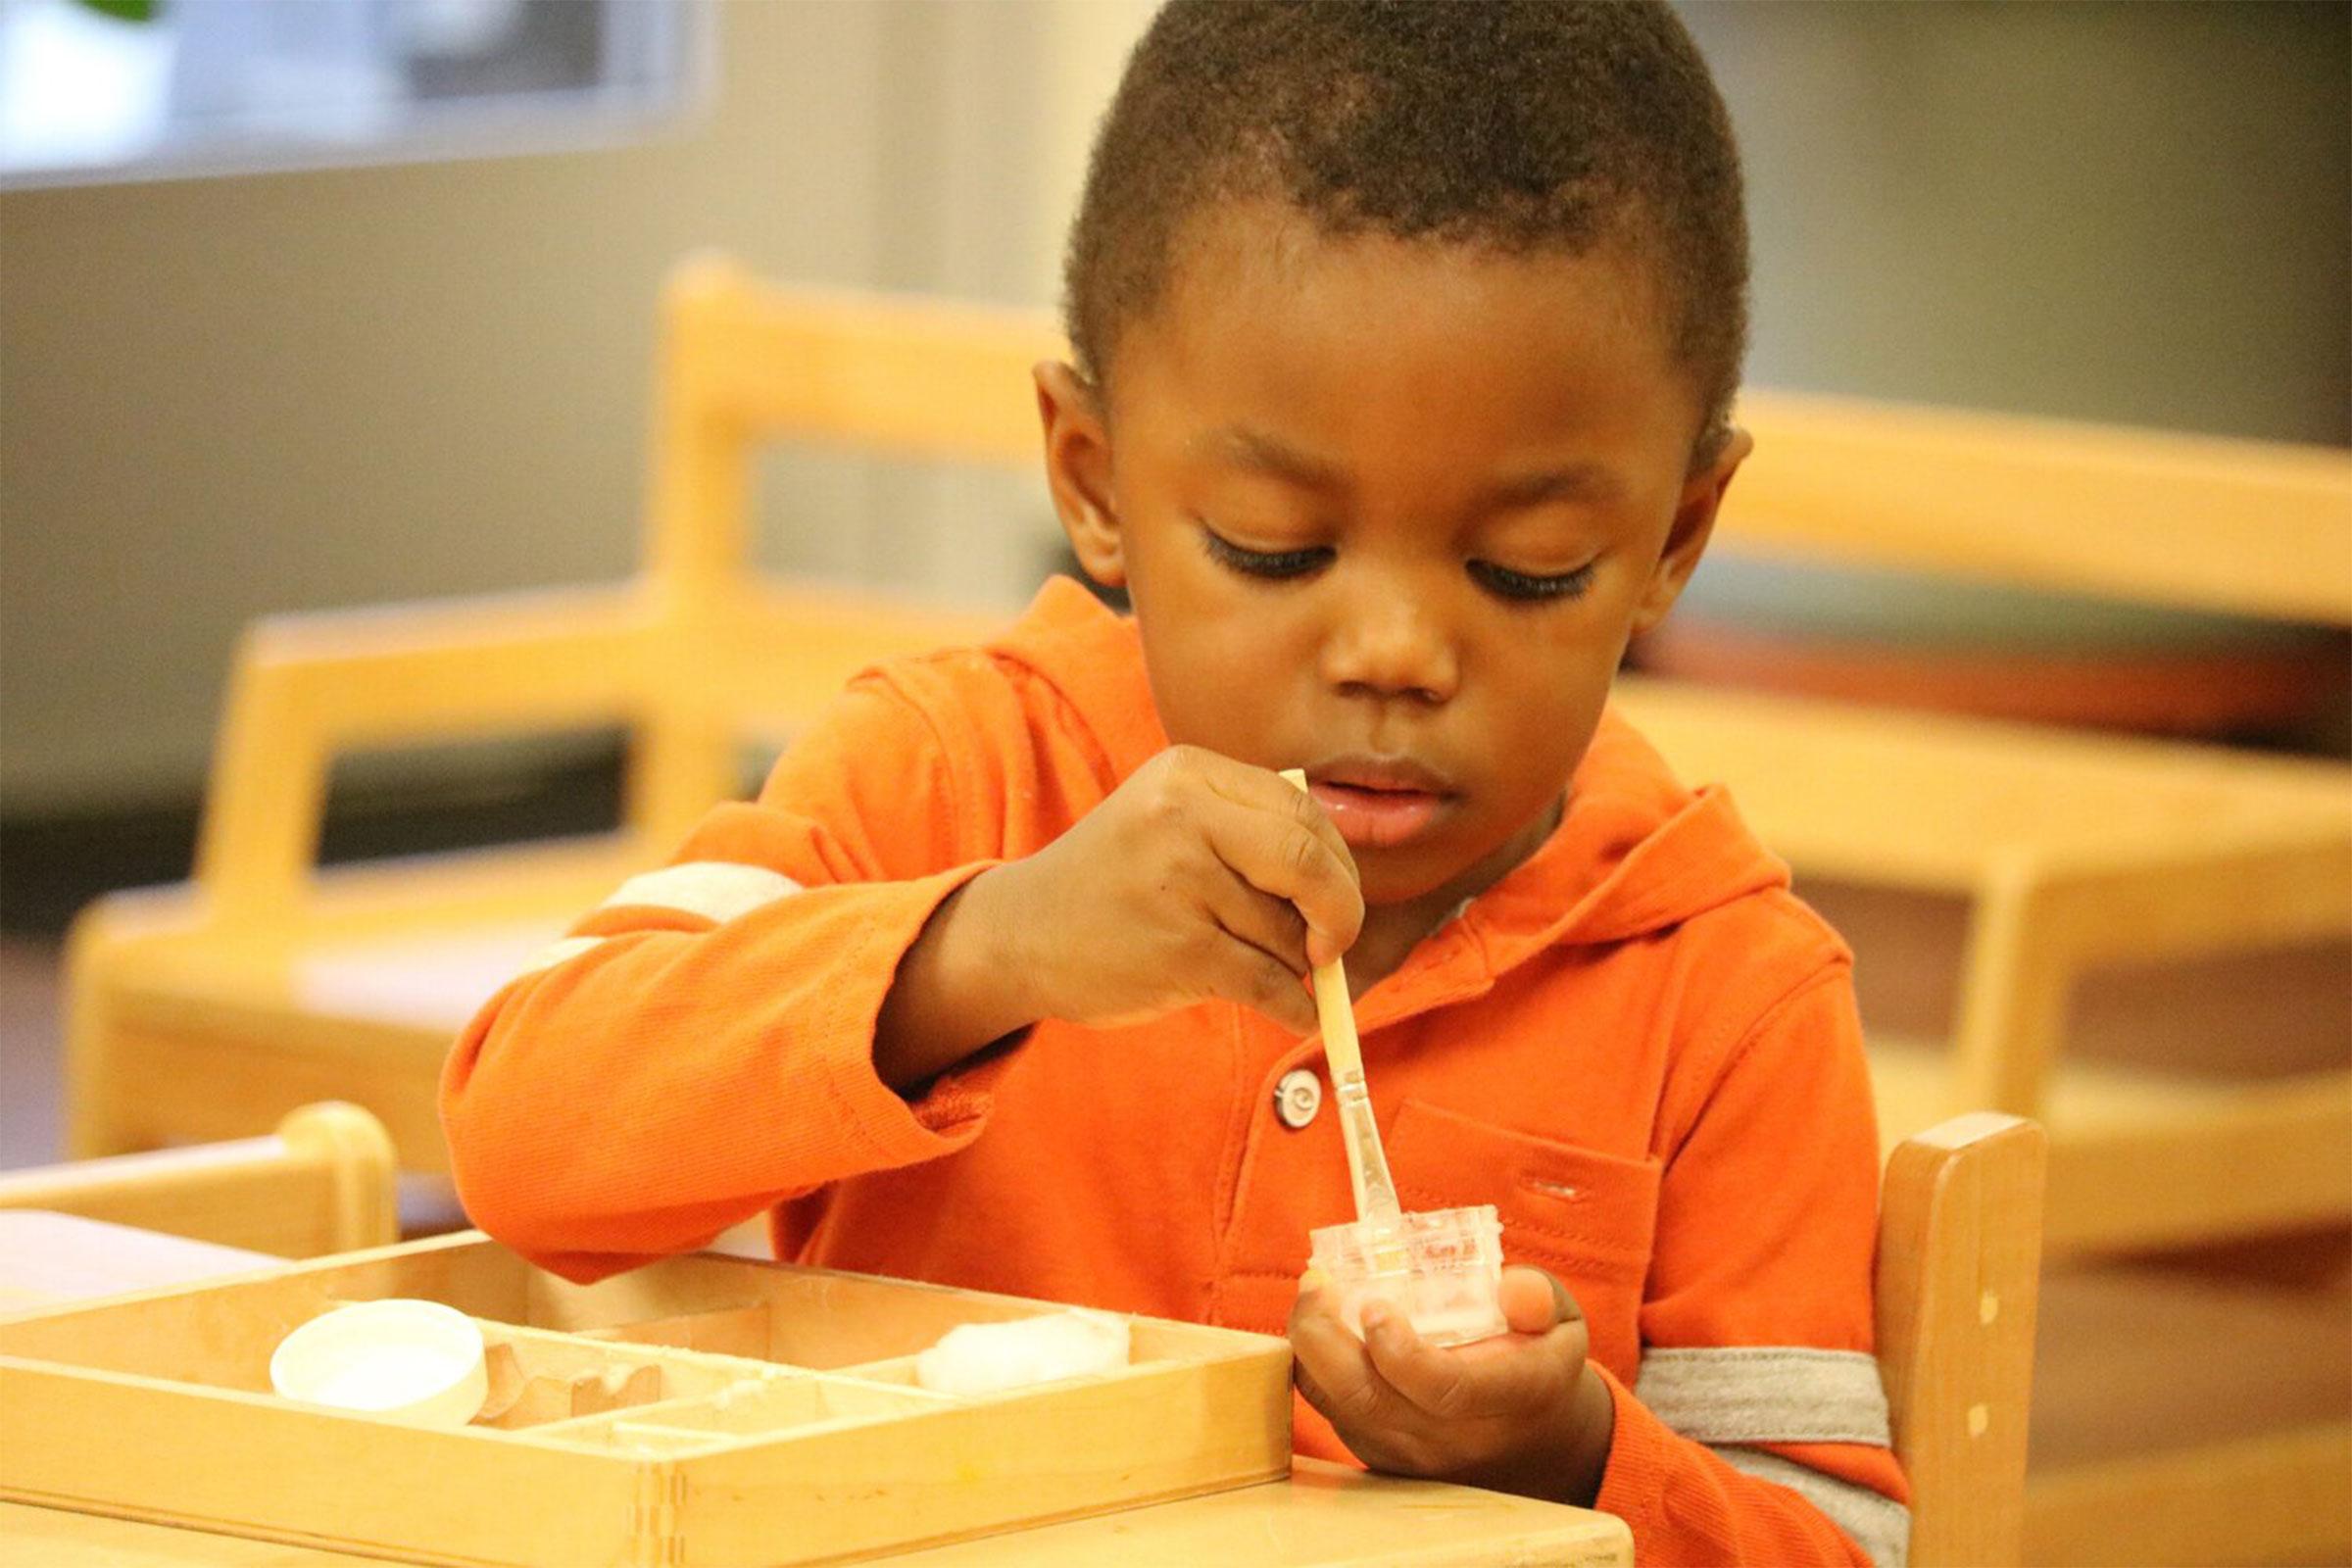 African child in Montessori classroom